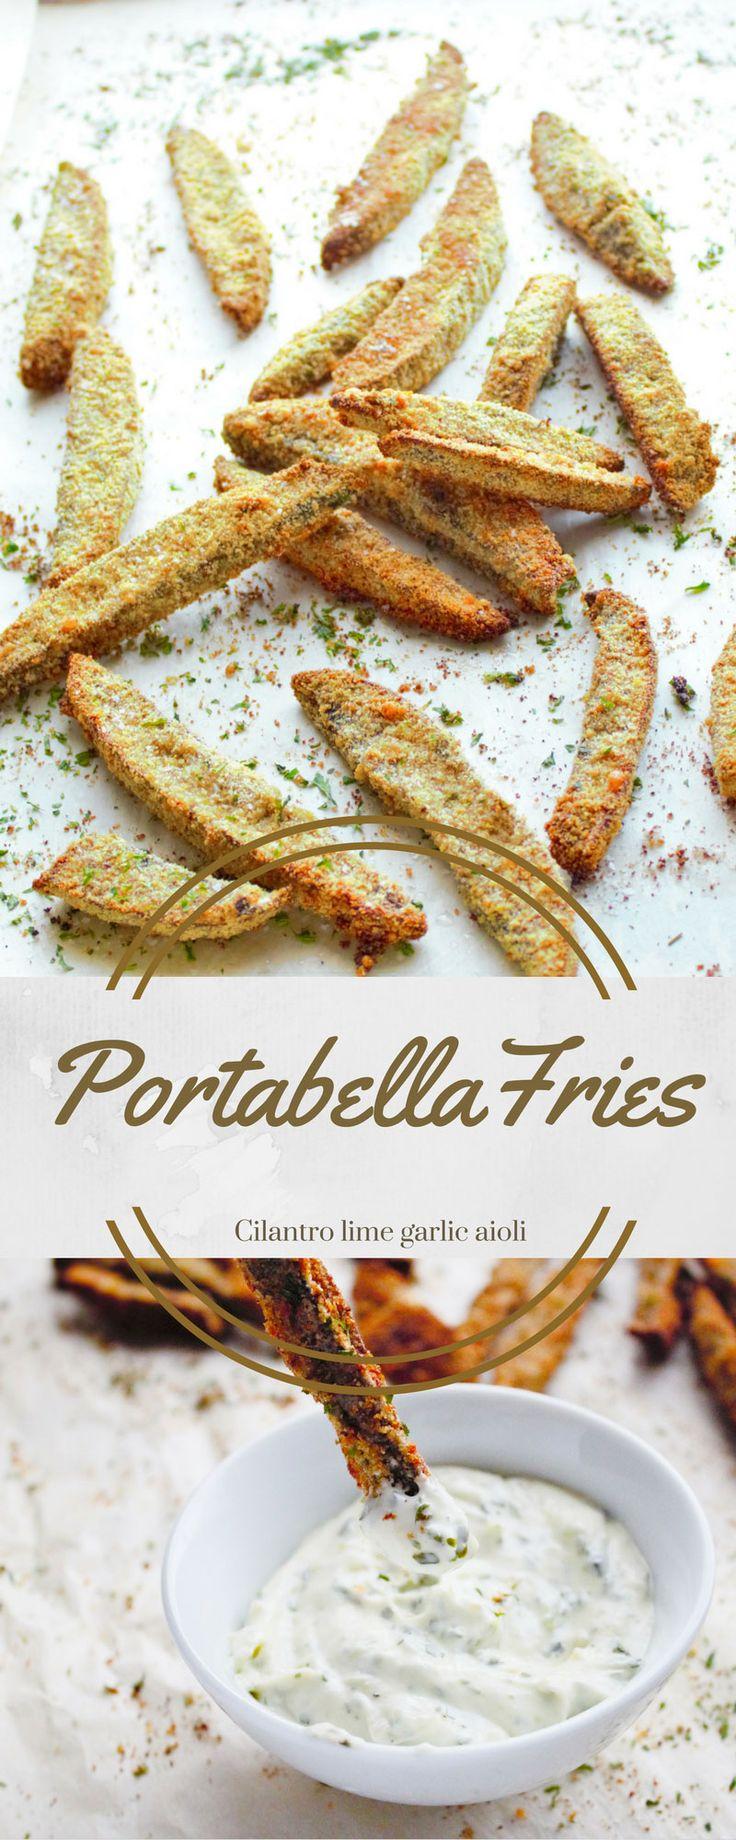 Healthy baked fries, mushrooms, portobello, Parmesan, garlic, veggie fries, crispy baked fries